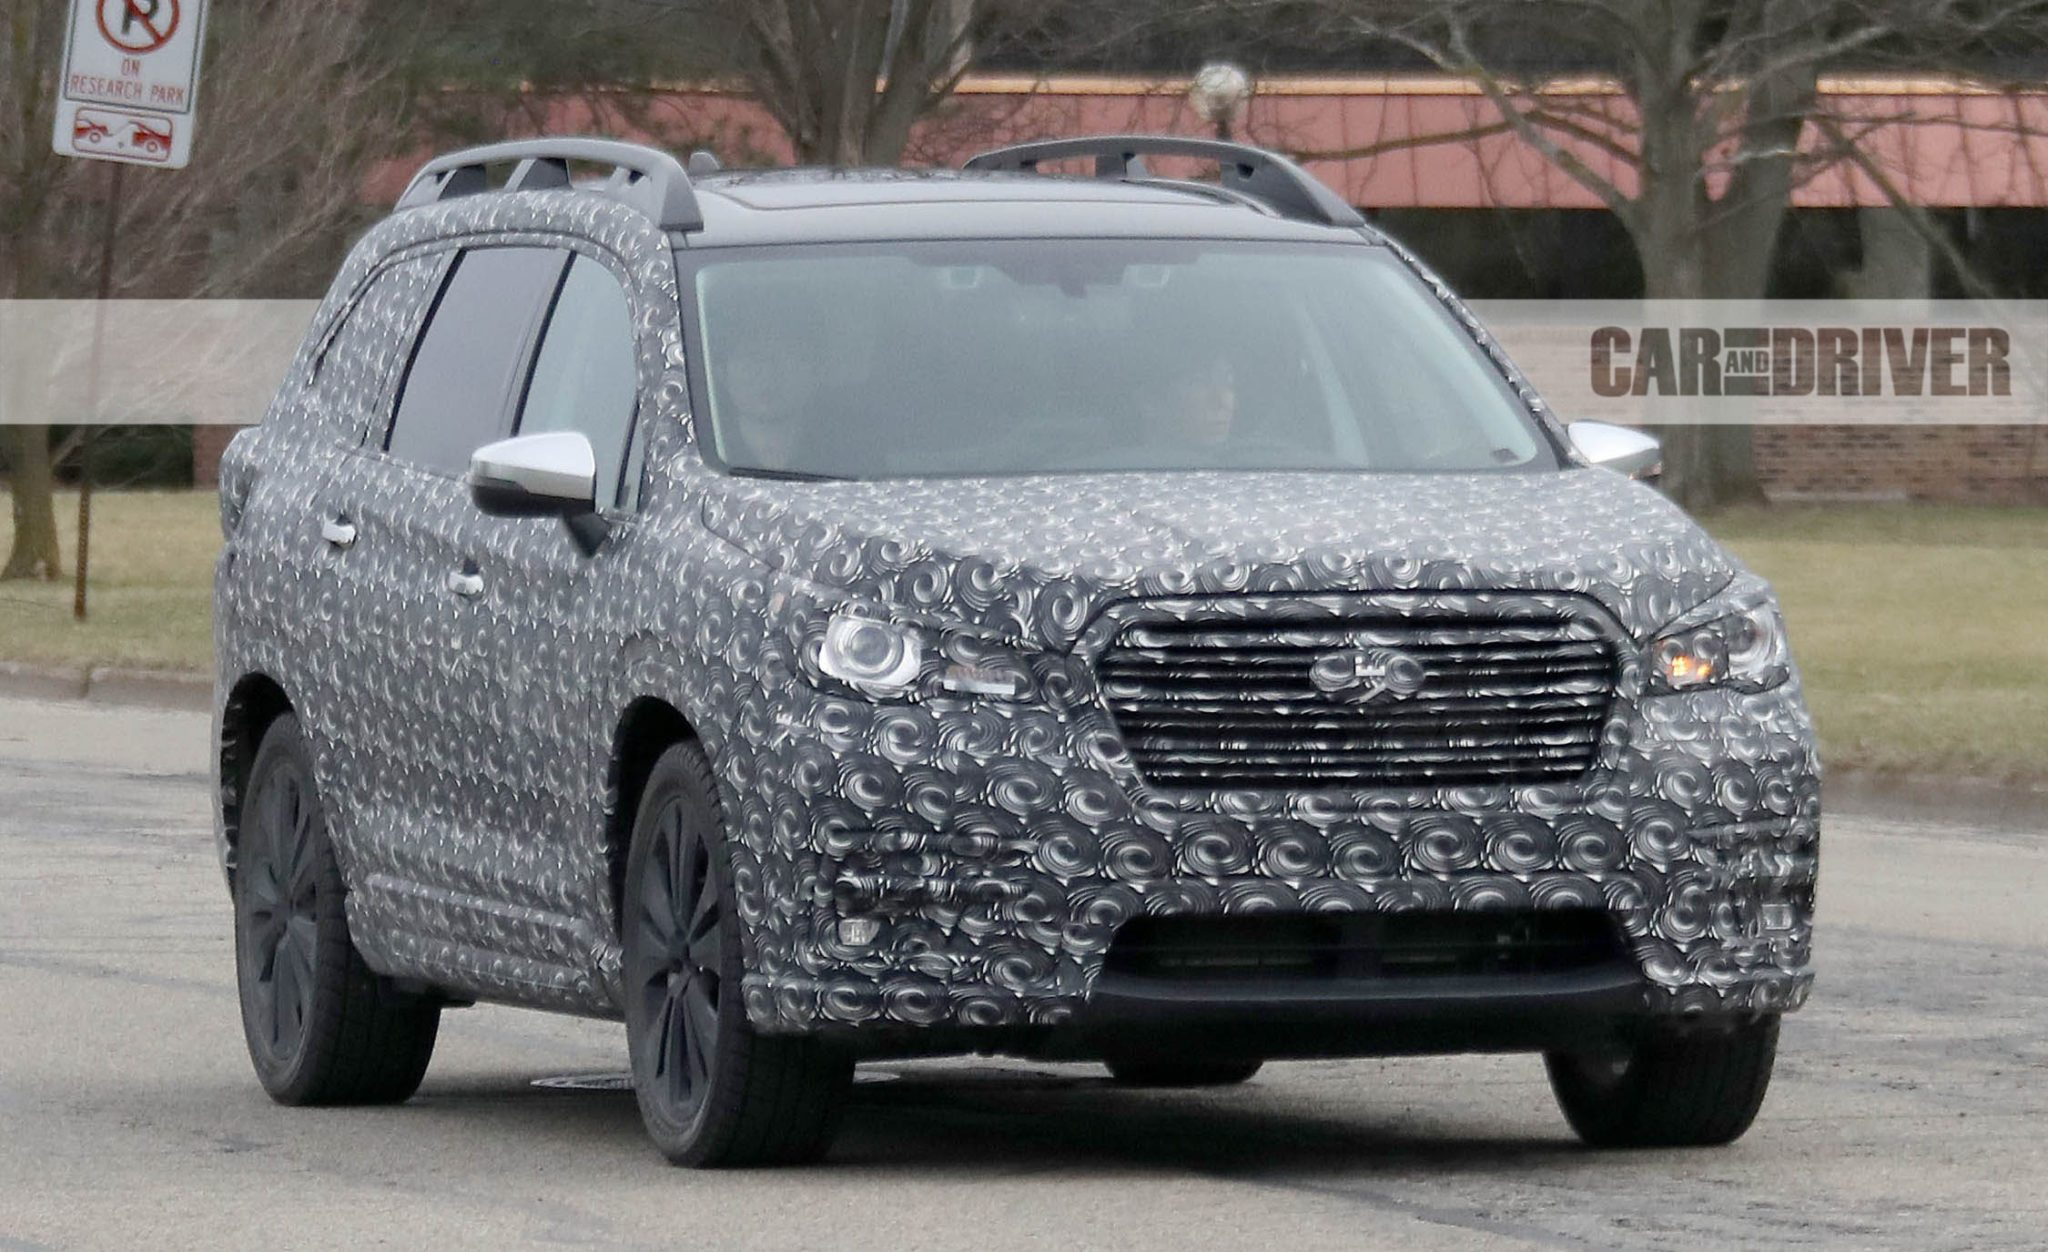 2018 Subaru Ascent Spied: The Three-Row Subie Comes into Sharper Focus